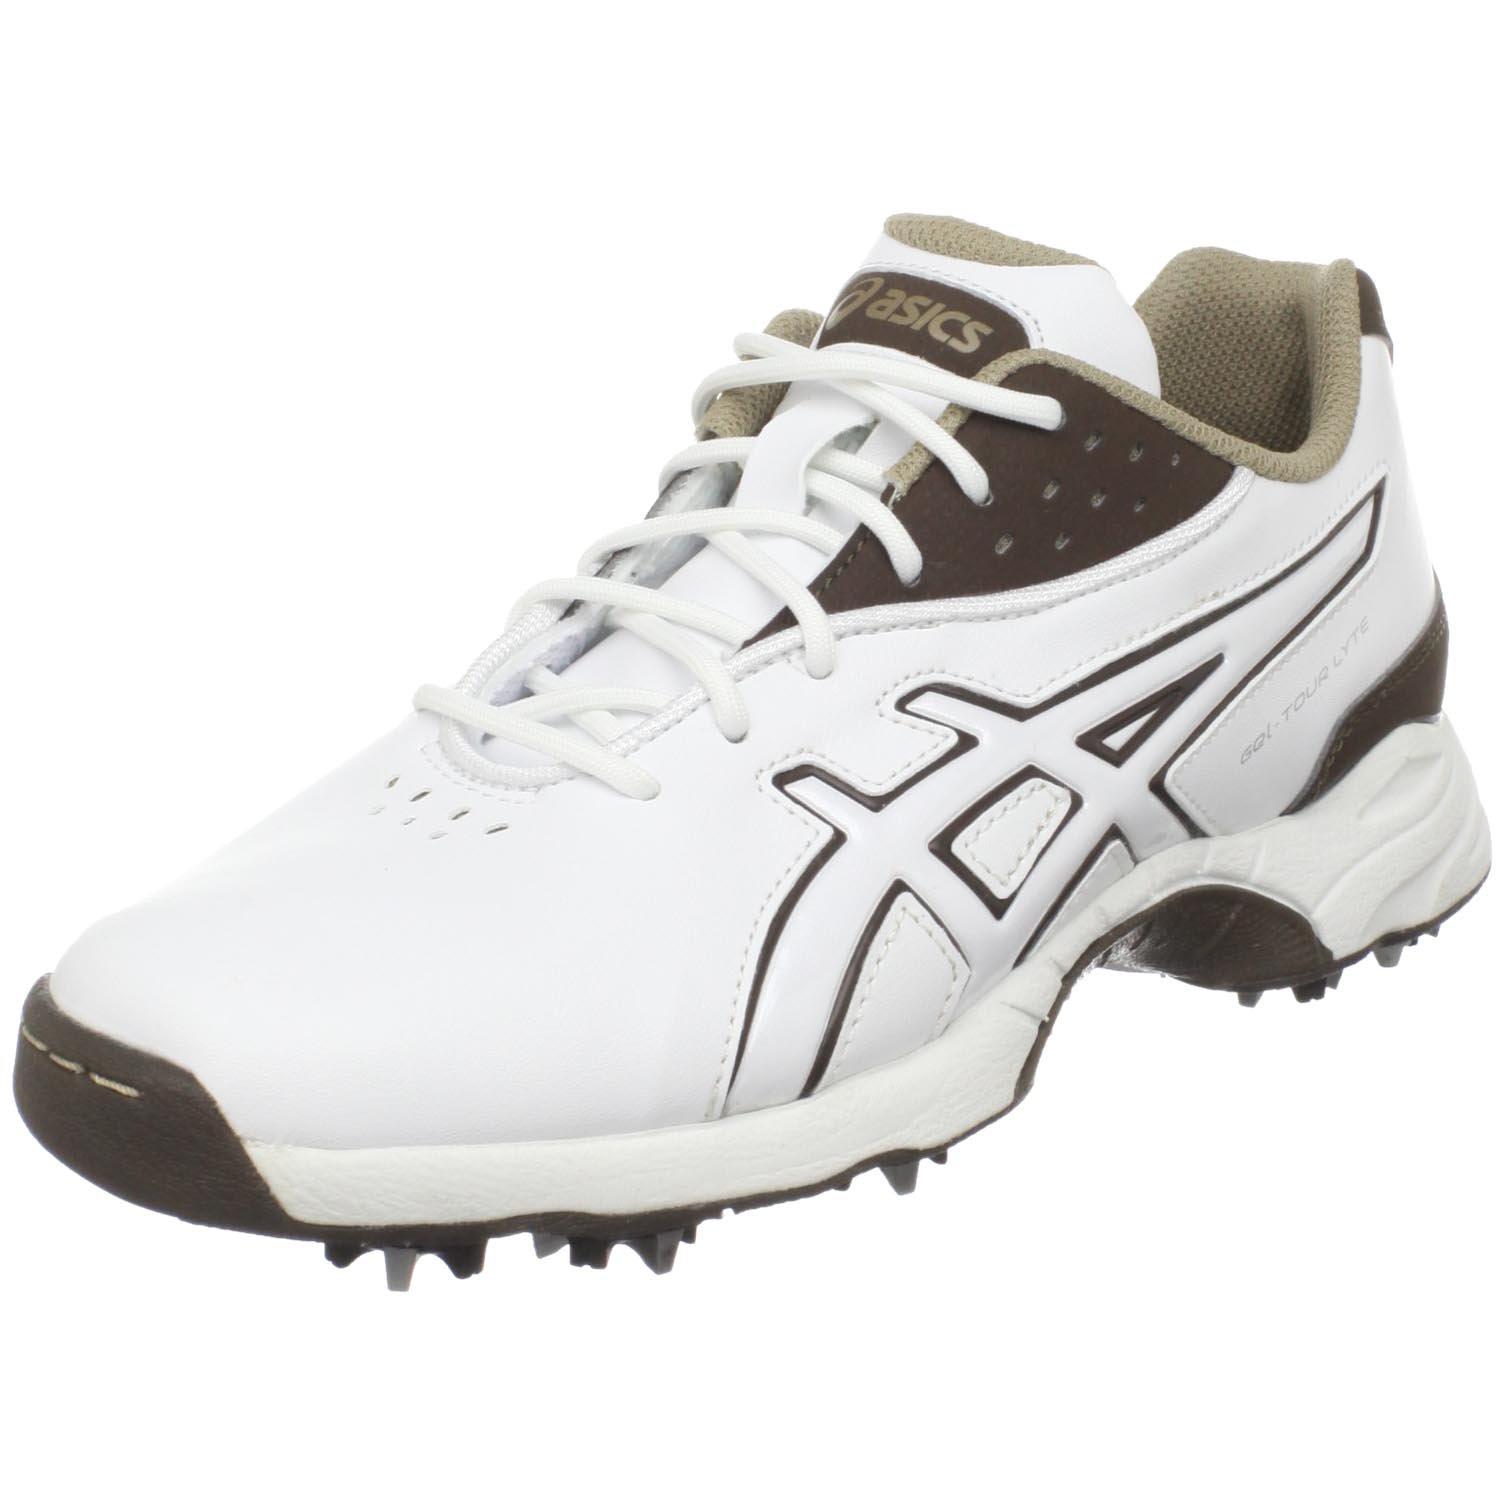 ASICS Women's GEL-Tour Lyte Golf Shoe,White/Coffee/Taupe,10.5 M